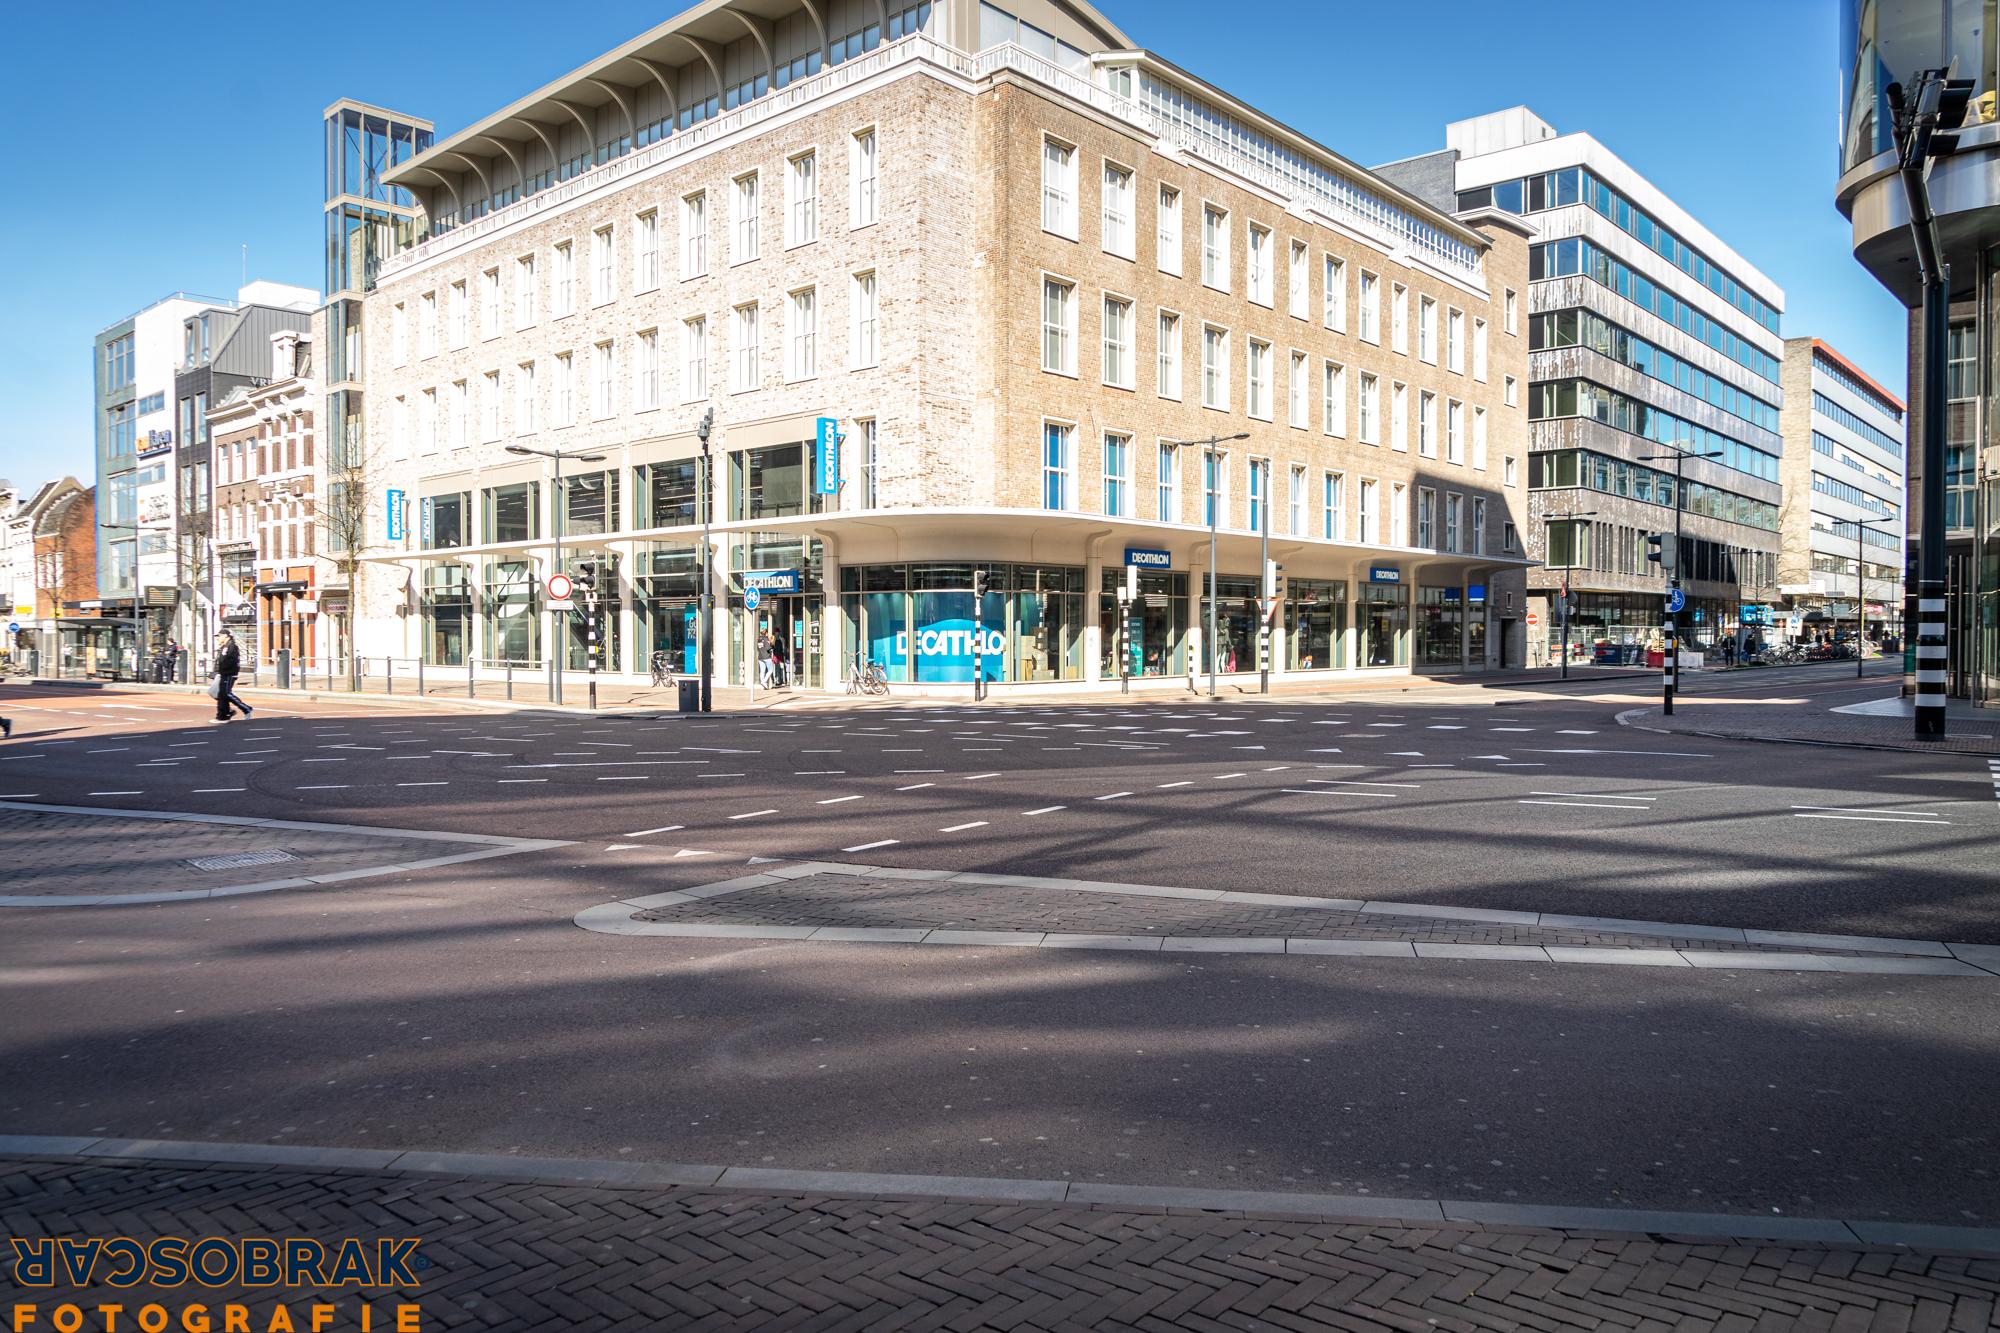 Utrecht Centrum, Corona, Covid-19, Oscar Brak Fotografie